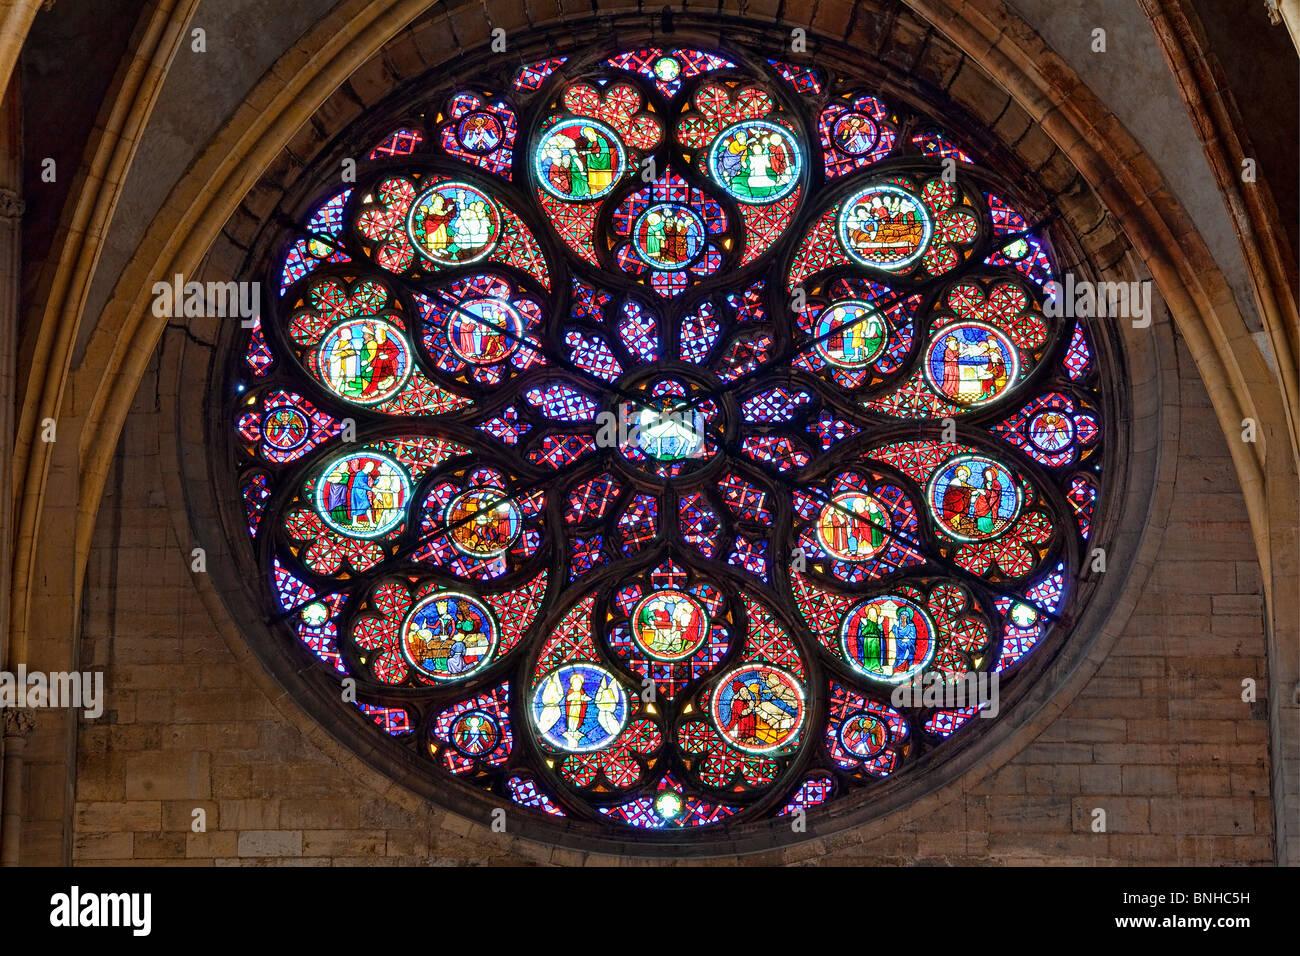 Europe, France, Rhone (69), Lyon, Saint-Jean Cathedral - Stock Image